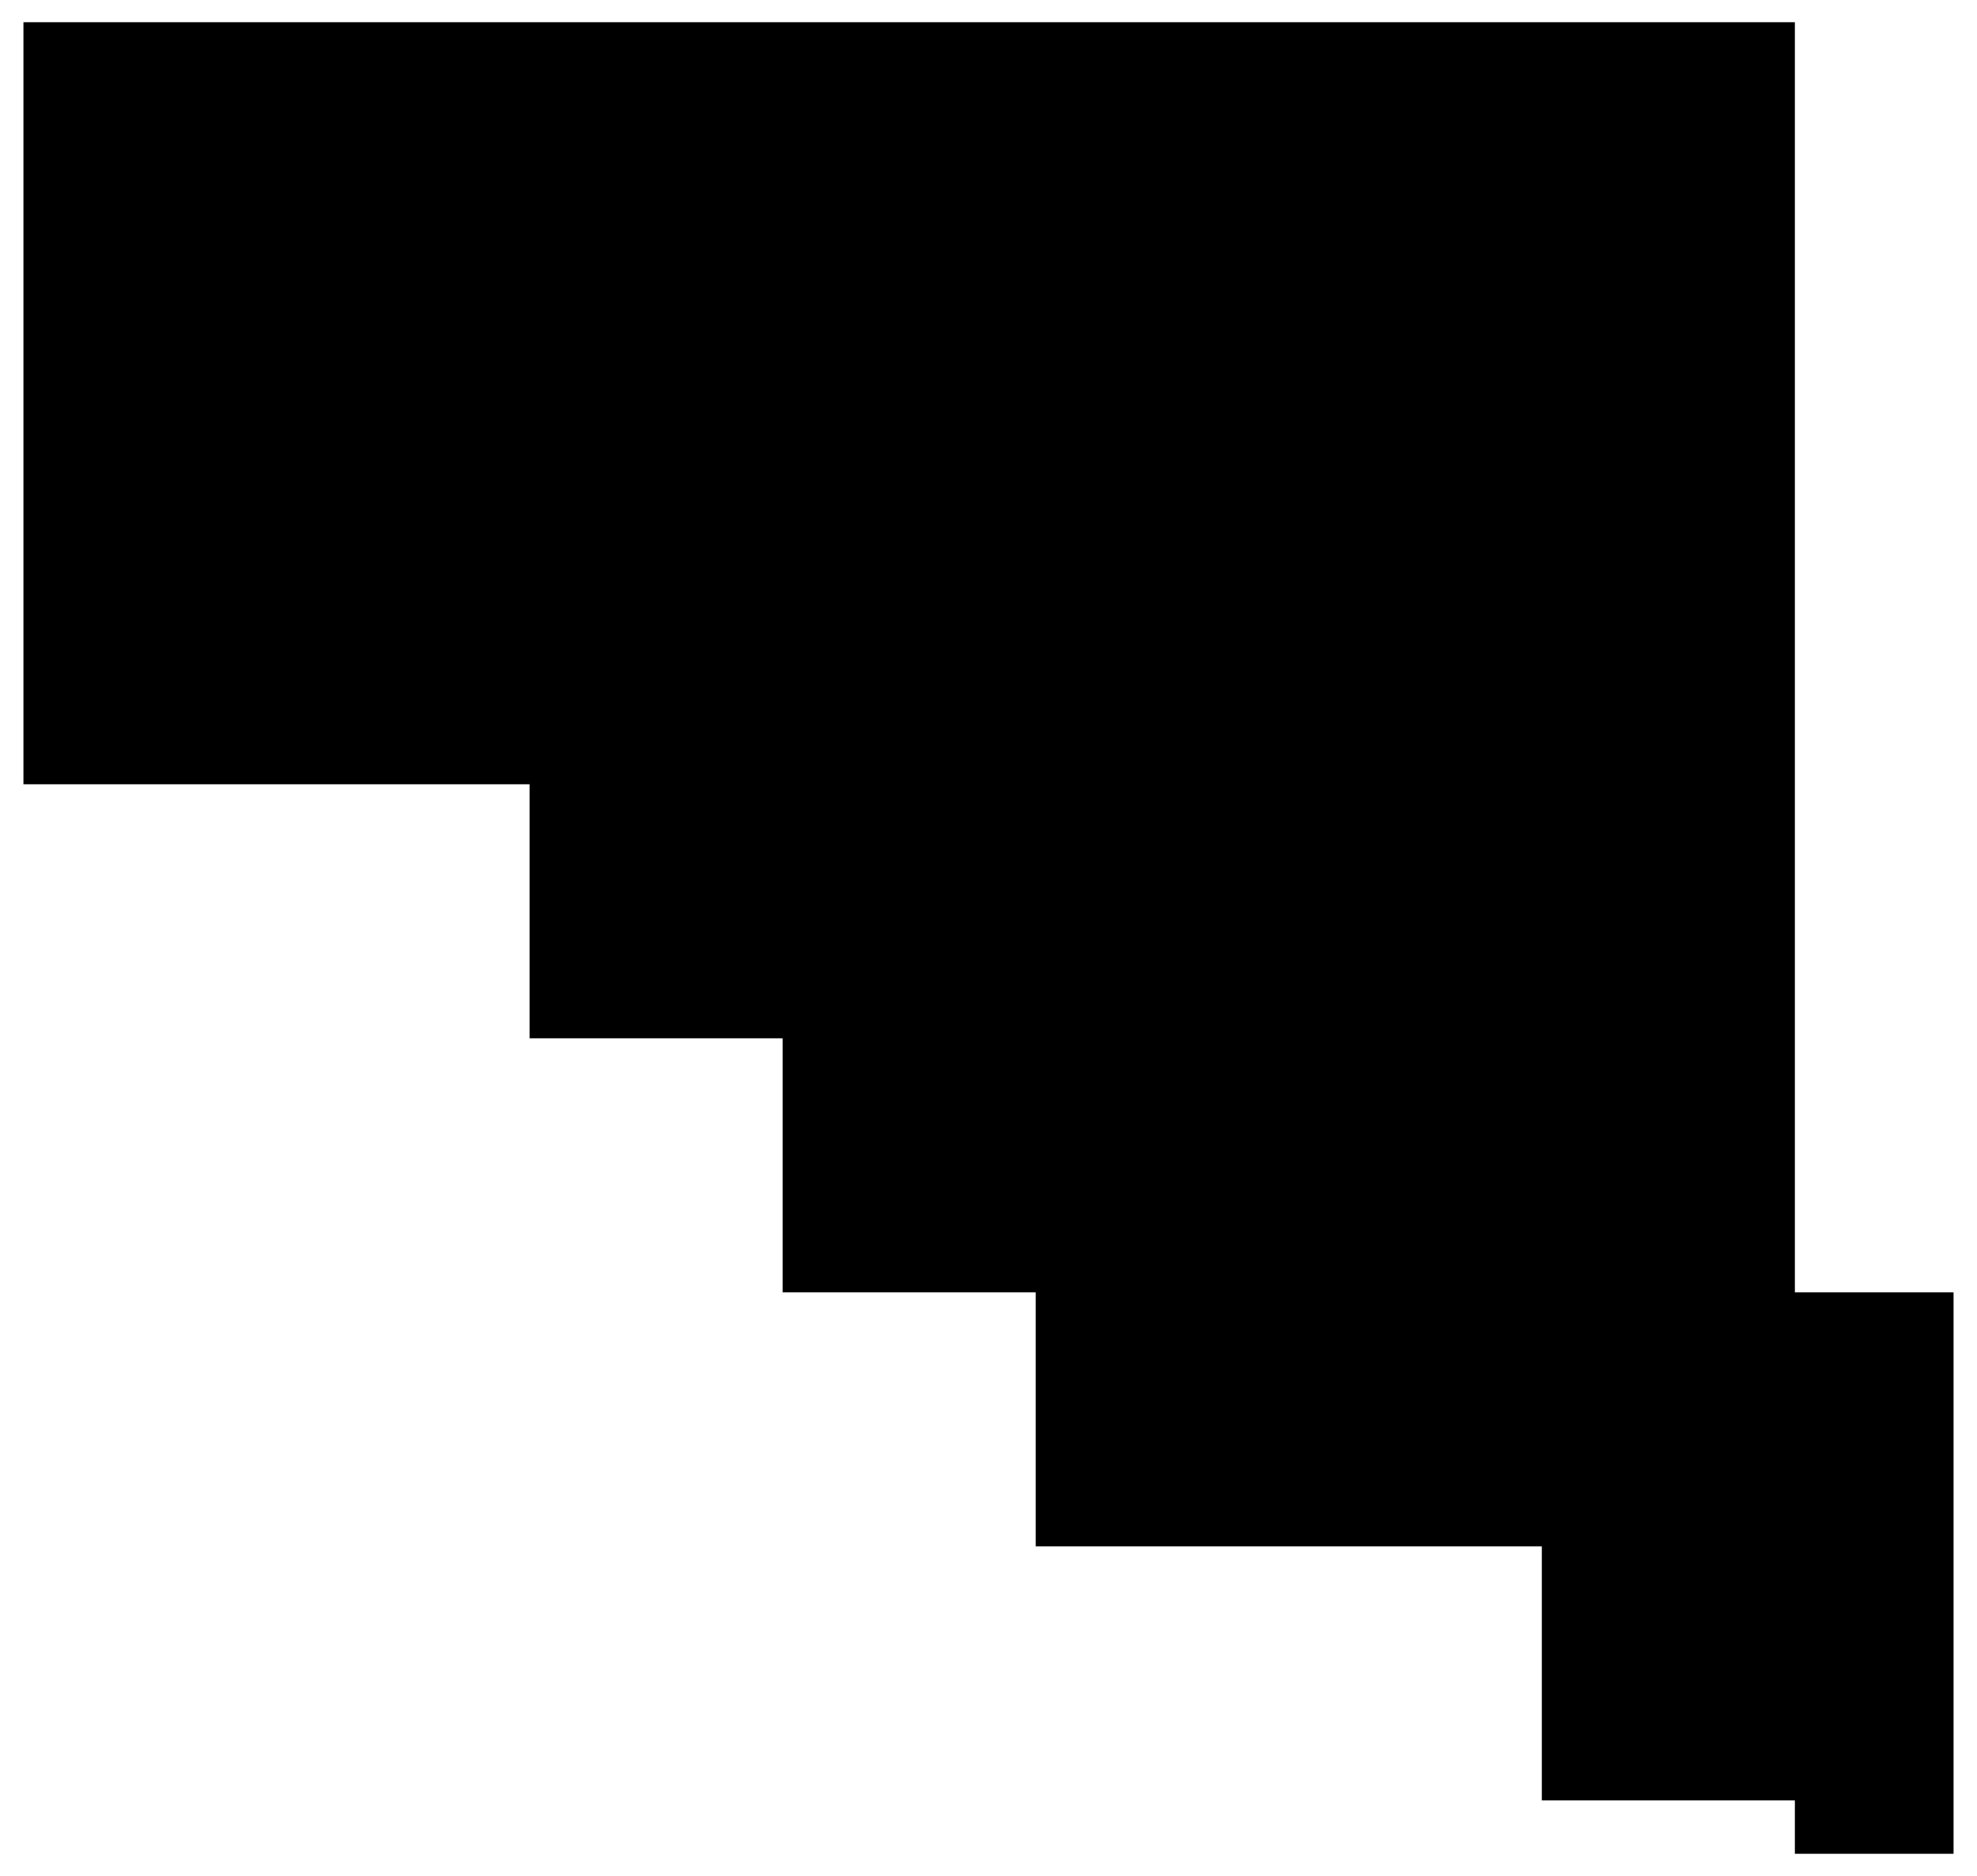 Pixie silhouette clipart jpg free stock Silhouette Fairy Clip art - Fairy with Wand Silhouette PNG ... jpg free stock